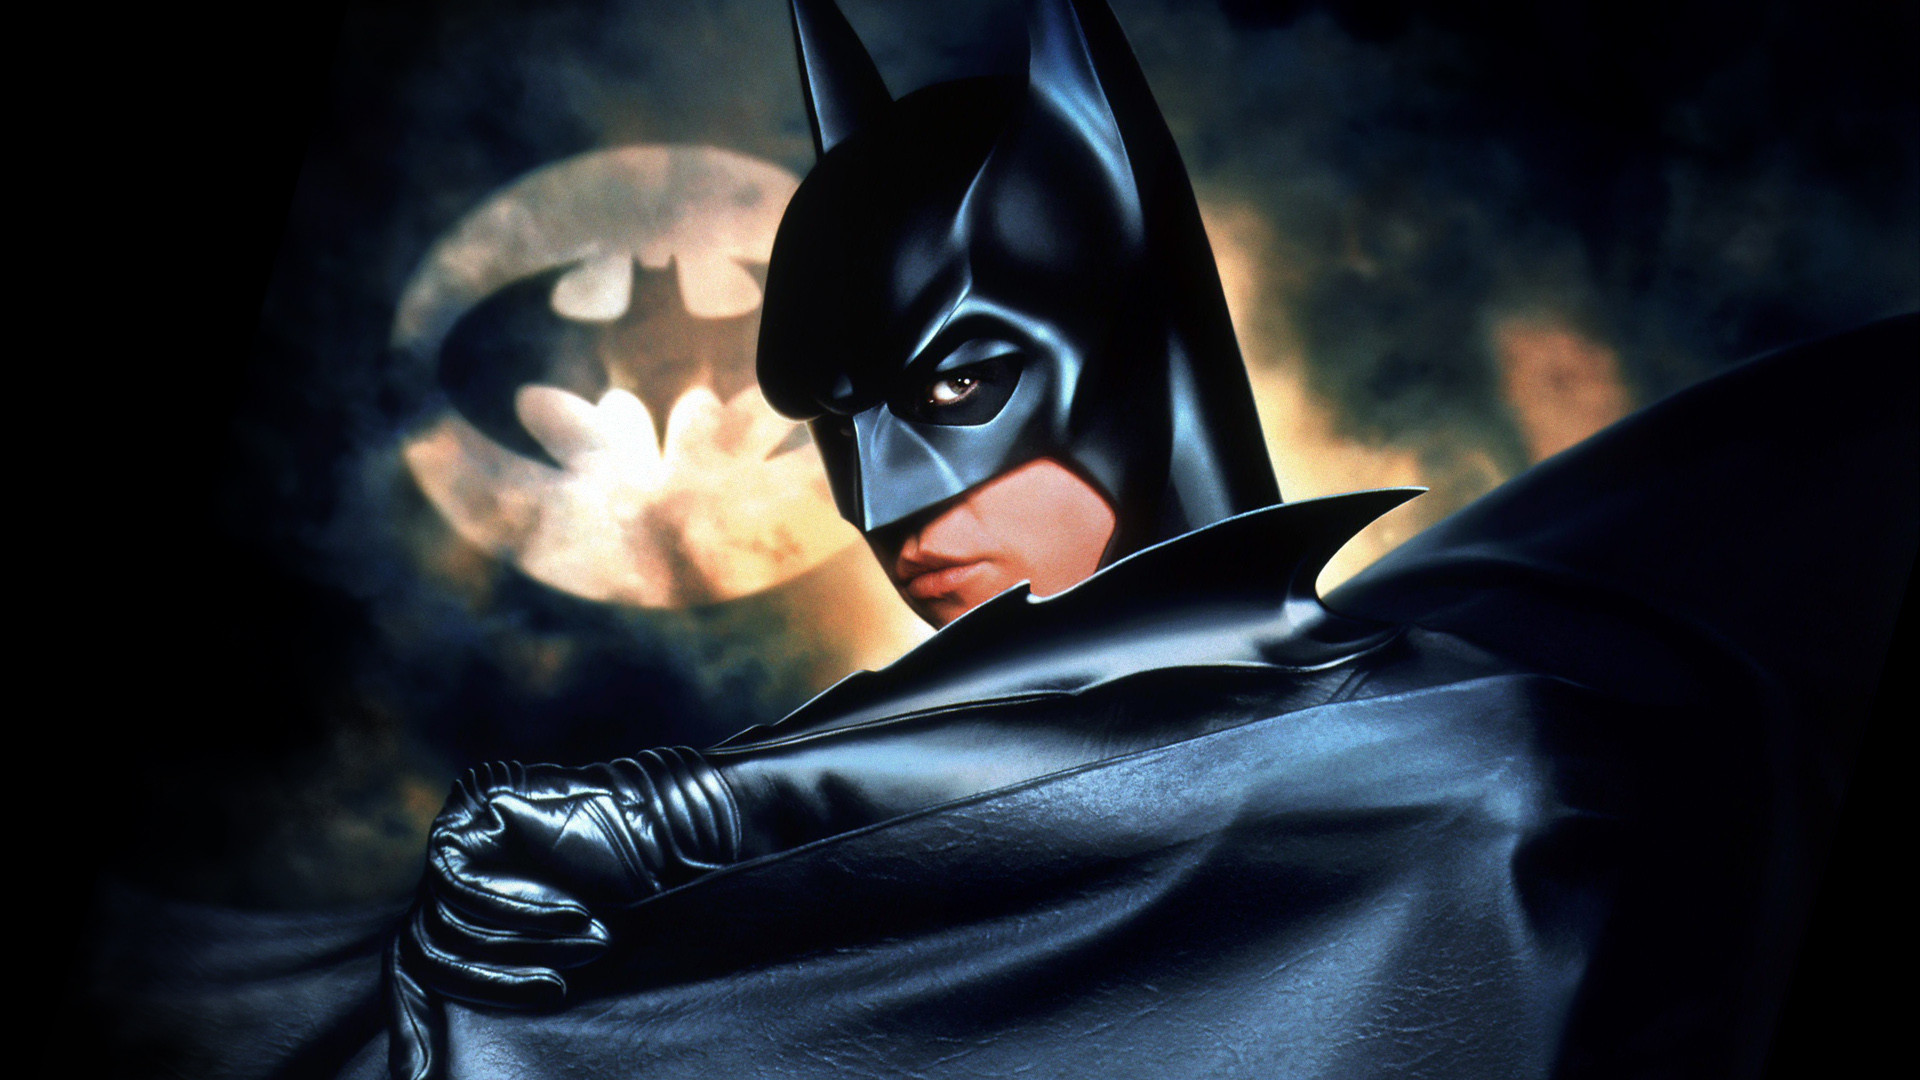 Batman Forever Movie Wallpapers WallpapersIn4knet 1920x1080